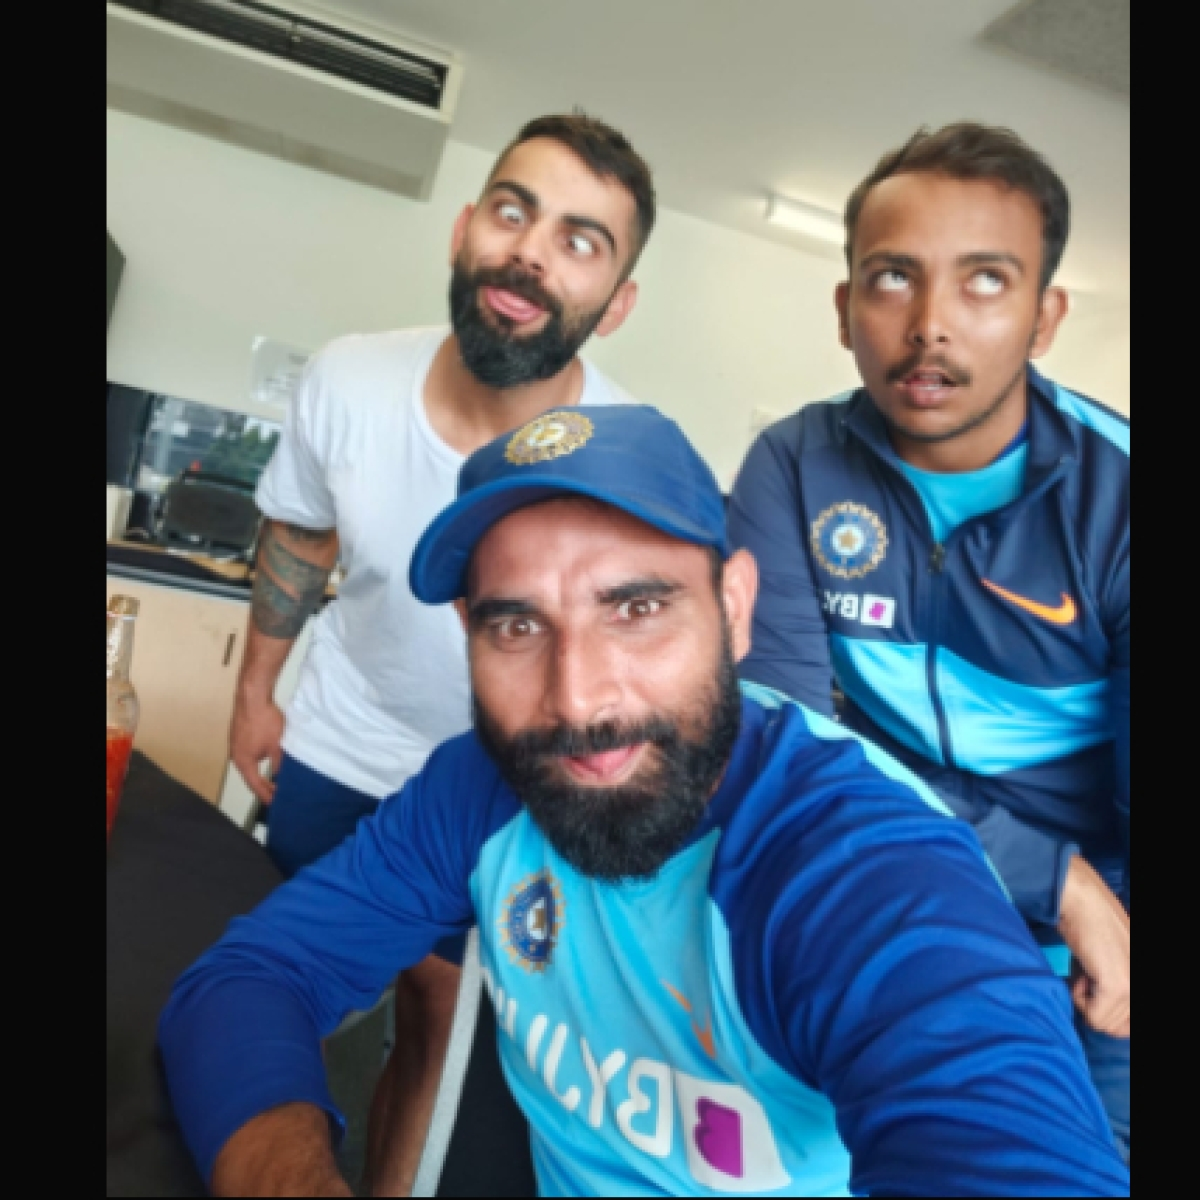 'Naya post sundar dost': Captain Kohli shares goofy pic with Mohammed Shami and Prithvi Shaw